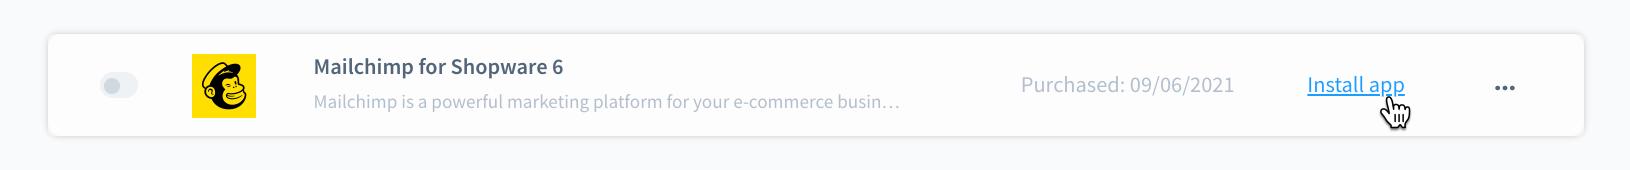 Cursor Clicks - Install App - Shopware 6